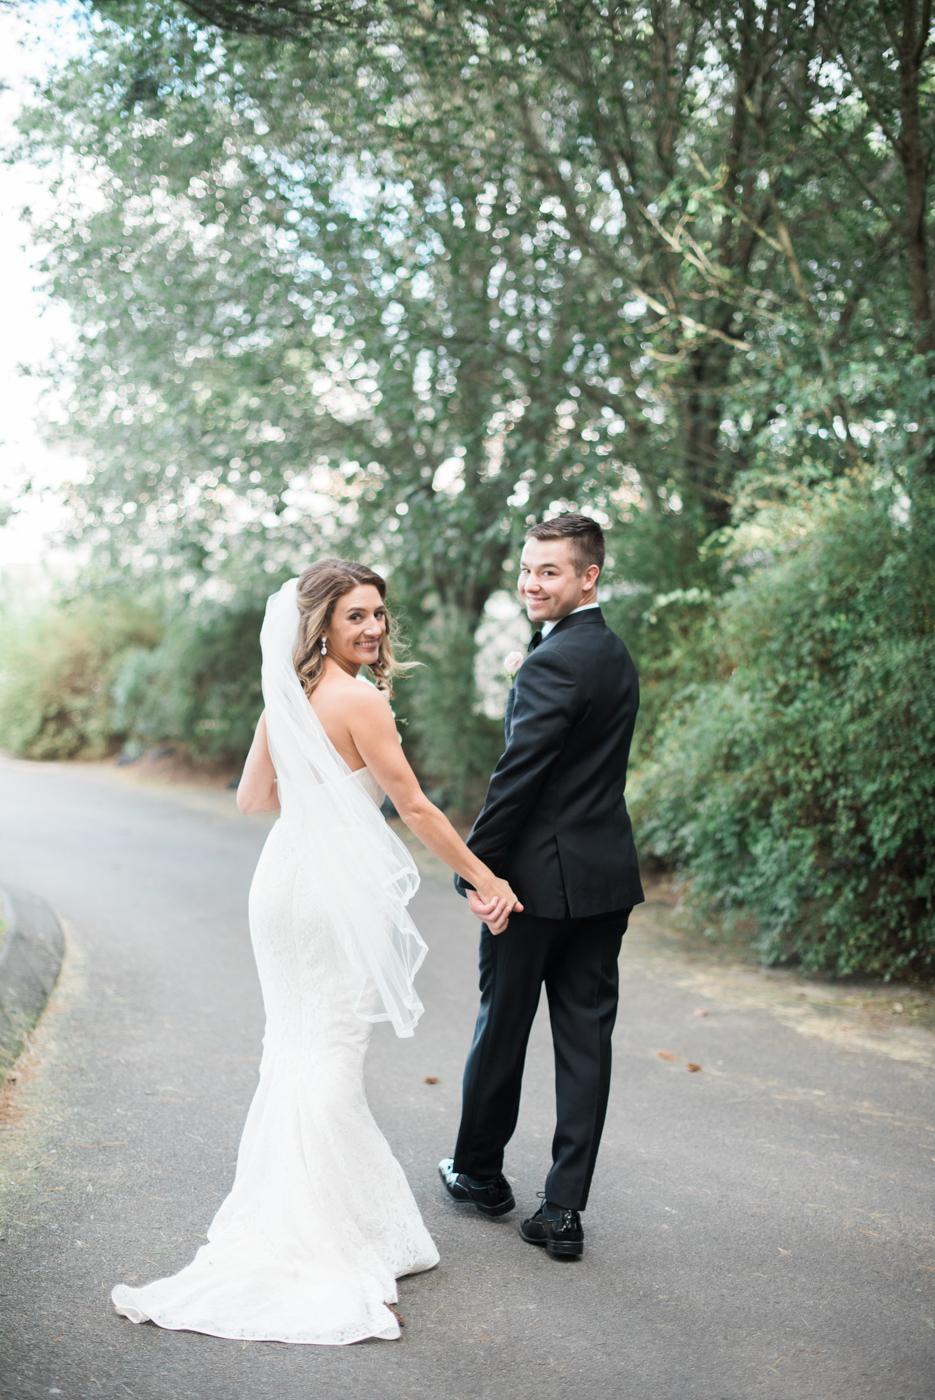 Top Wedding Photographers in boston